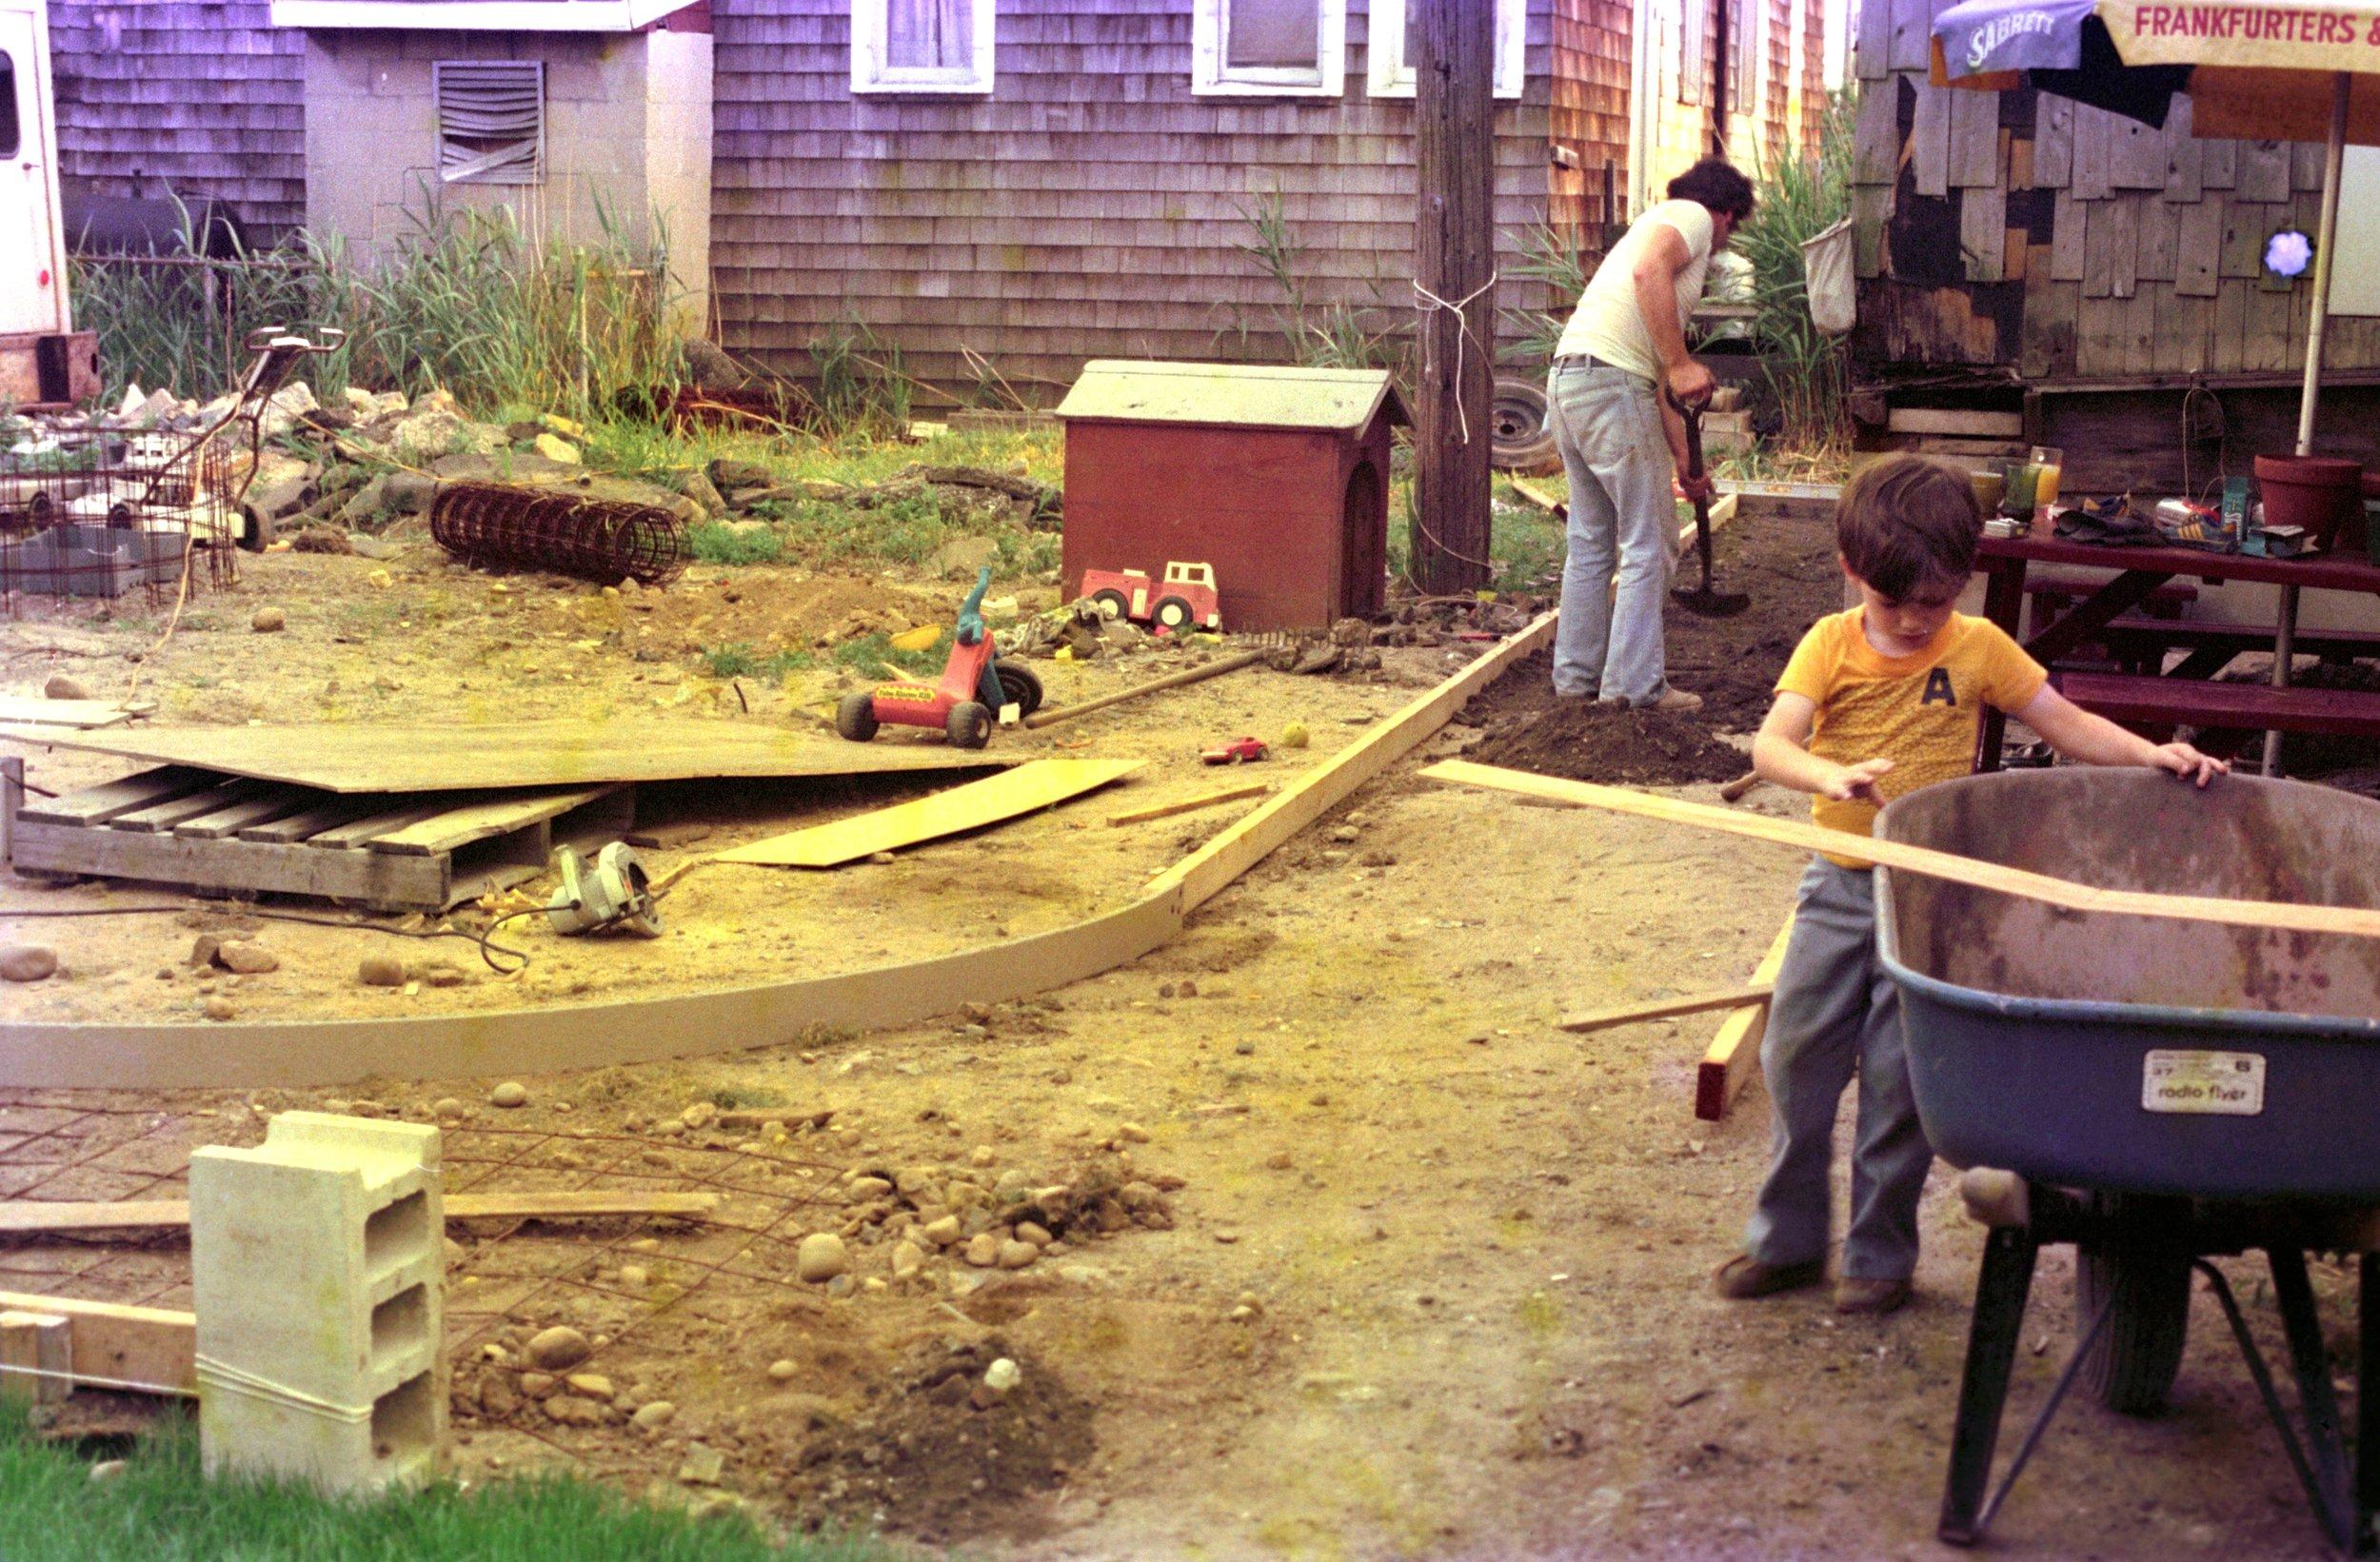 1978_Bird_Sanctuary_Tom_Laying_Cement_Helping_Tractor_Trucks_008.jpg